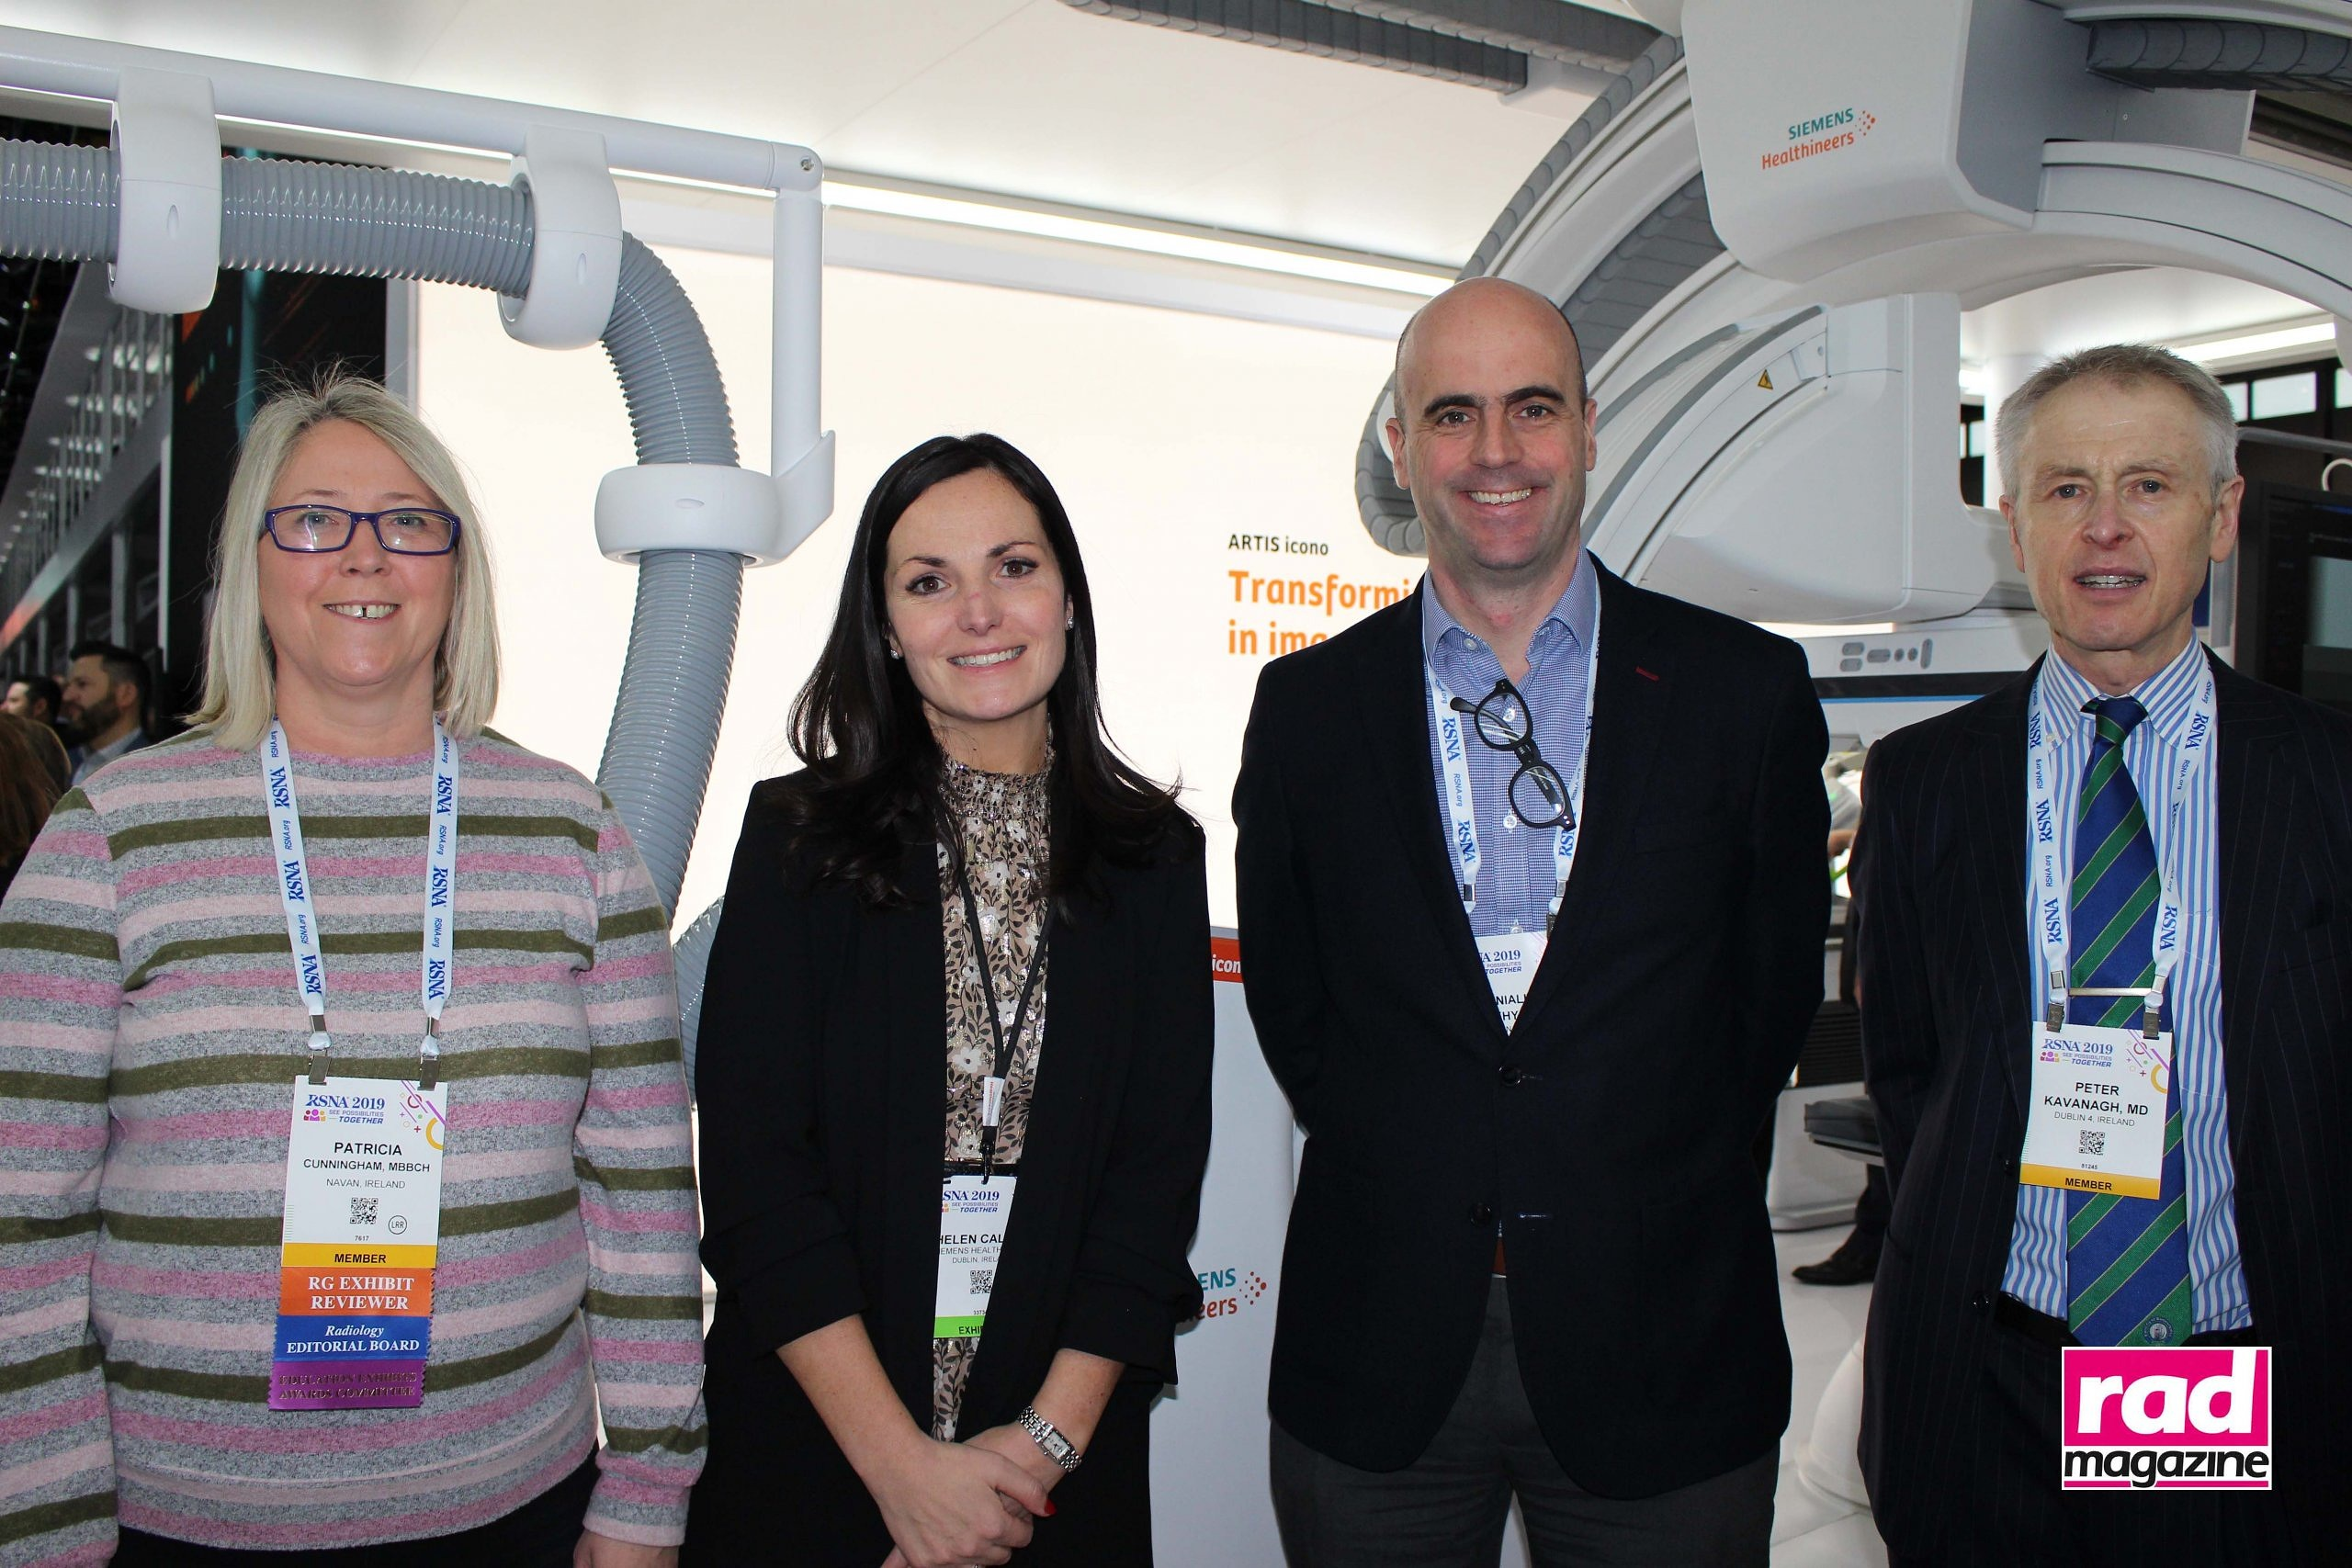 Siemens Healthineers Ireland at RSNA